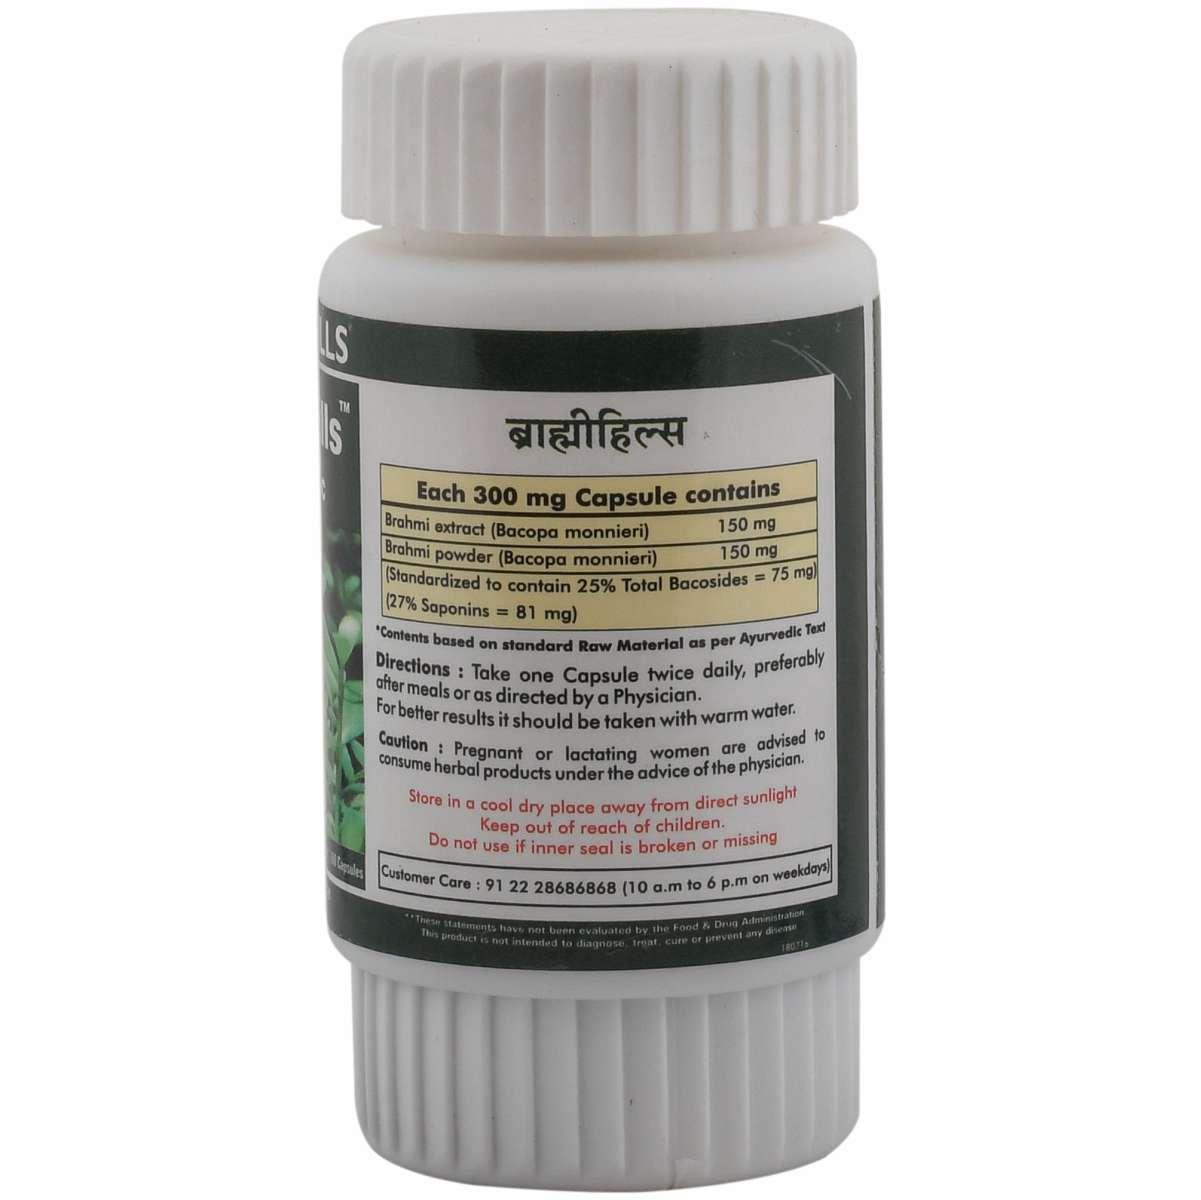 Ayurvedic medicine for memory & concentration - Brahmi 60 capsule